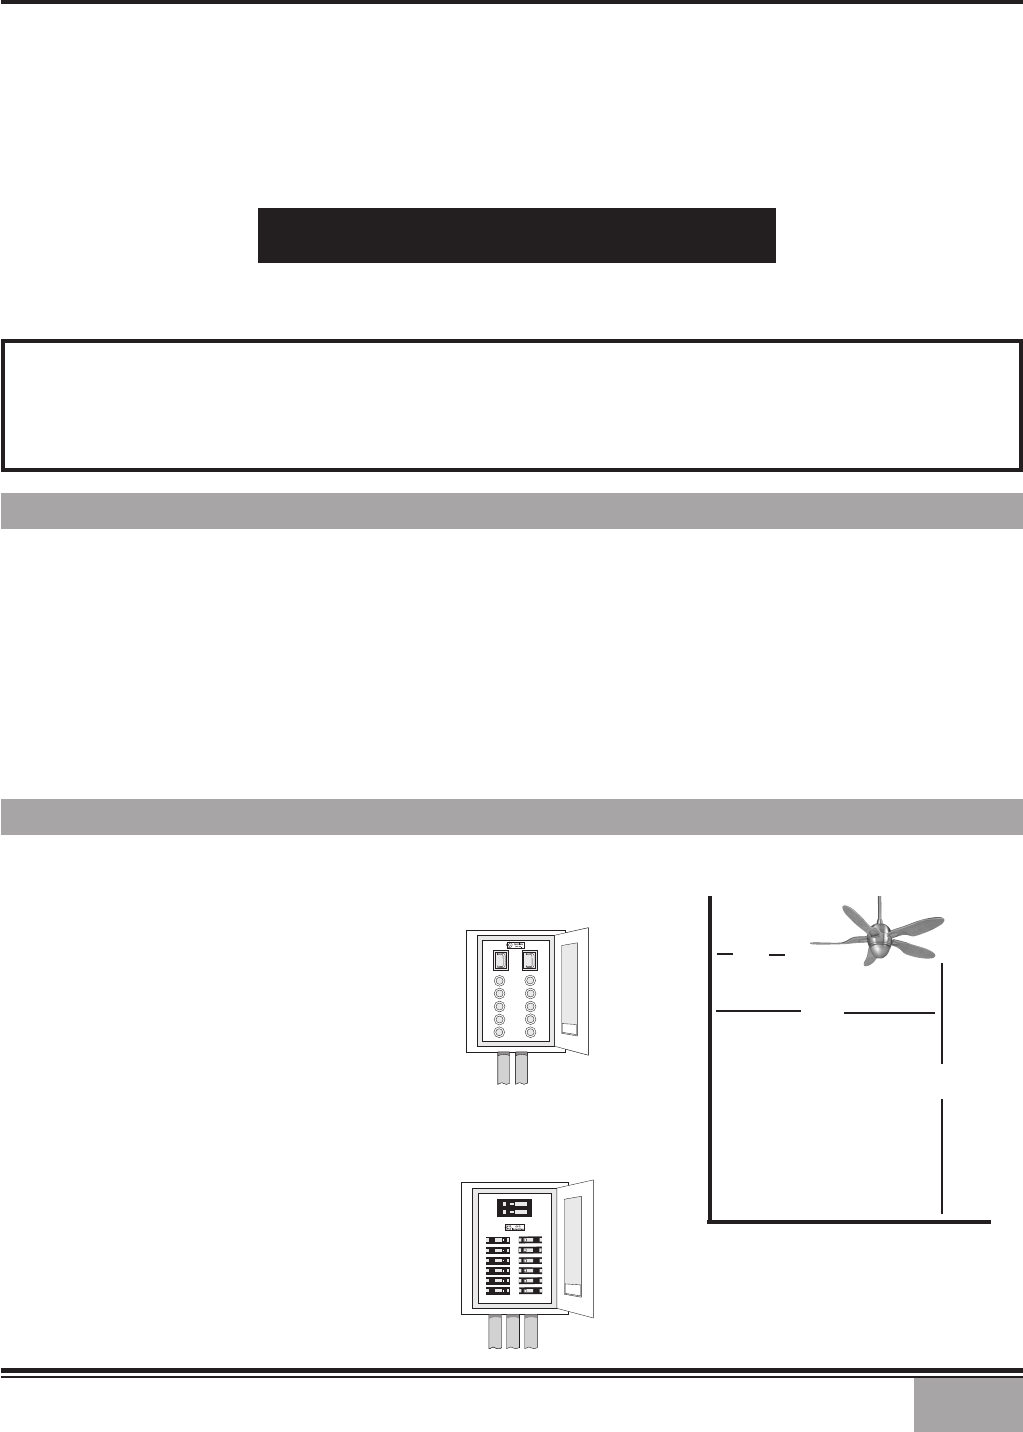 Casablanca Fan Company Modena Ii C10gxxm Users Manual Switch Wiring Diagram